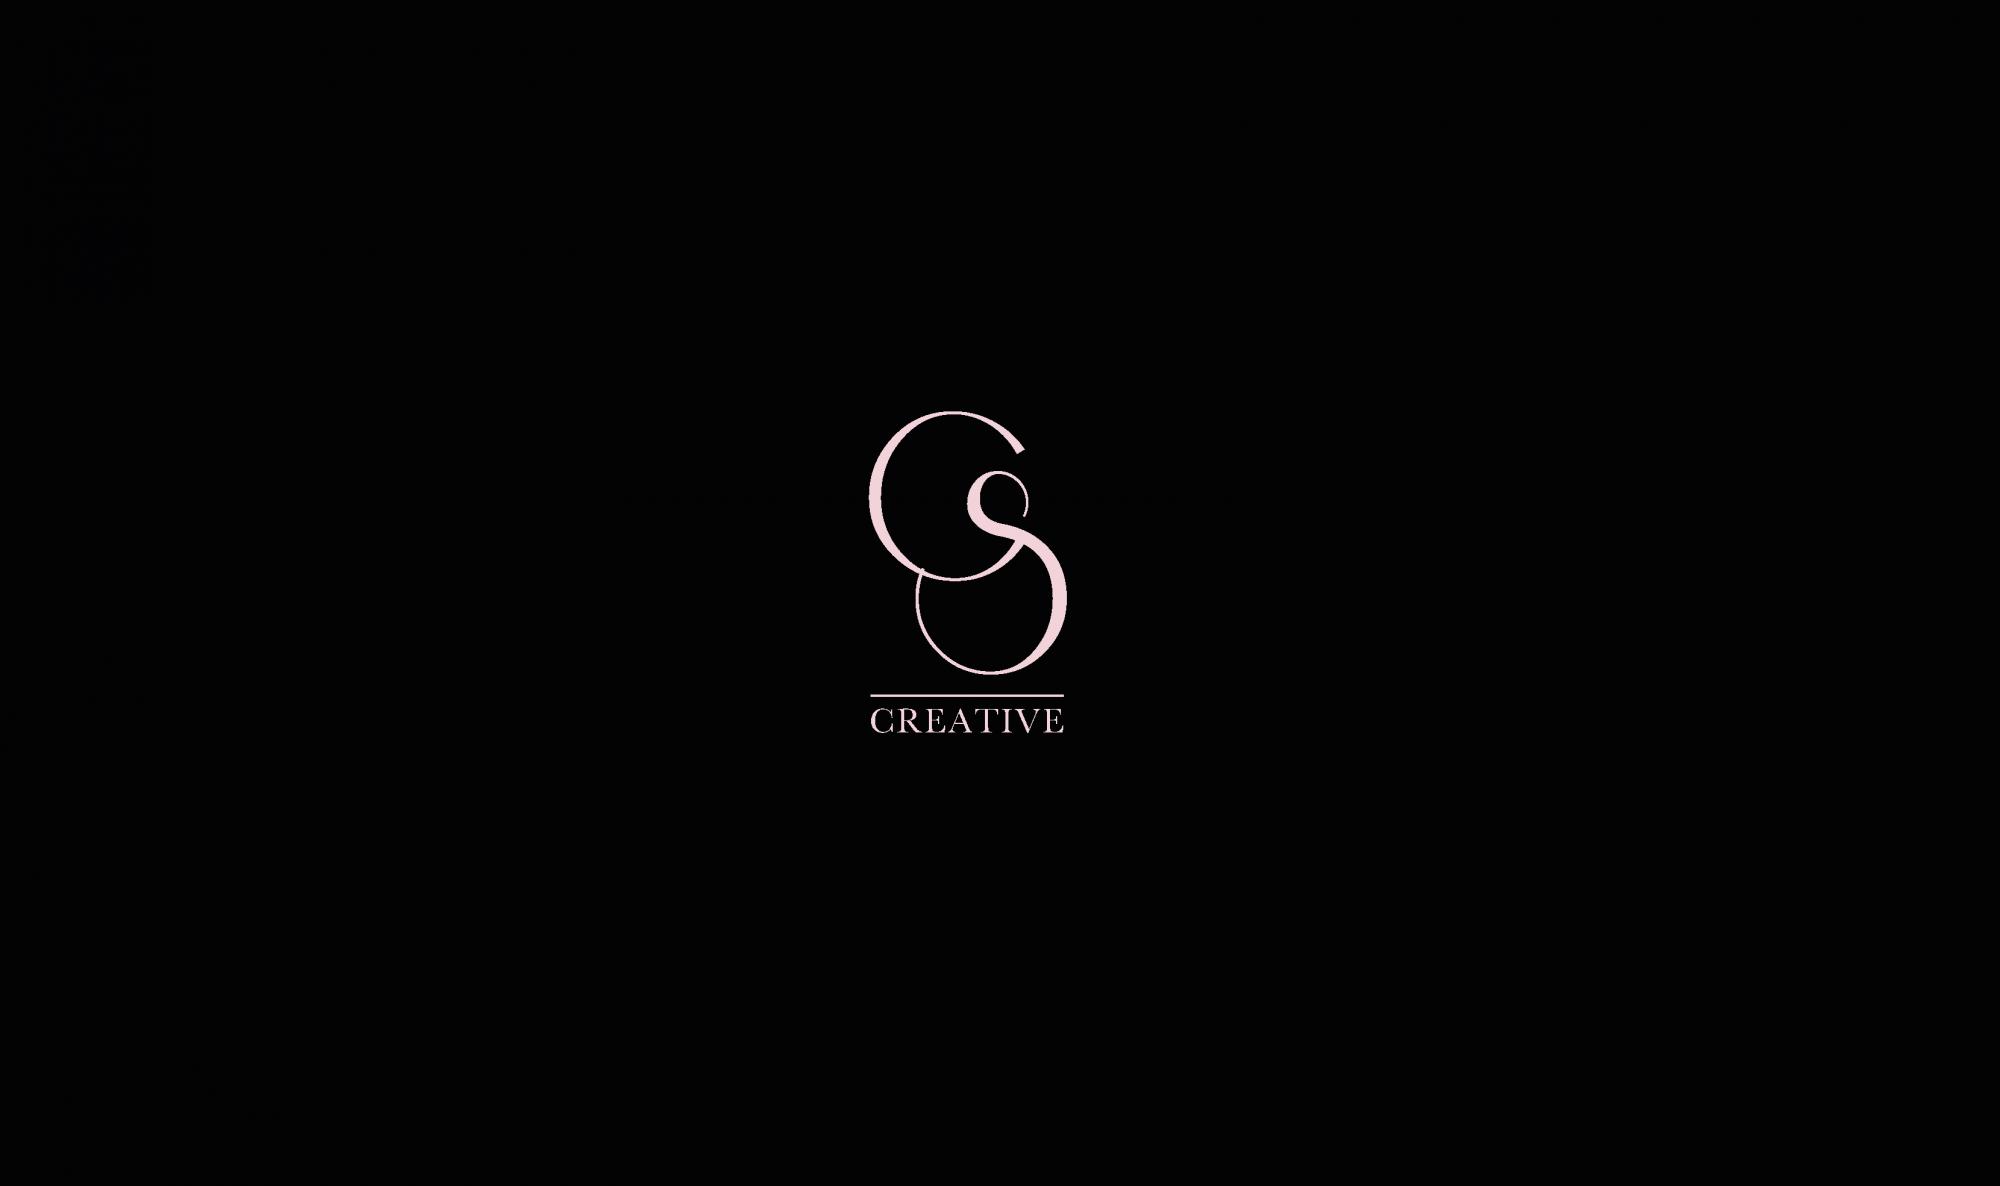 CS CREATIVE